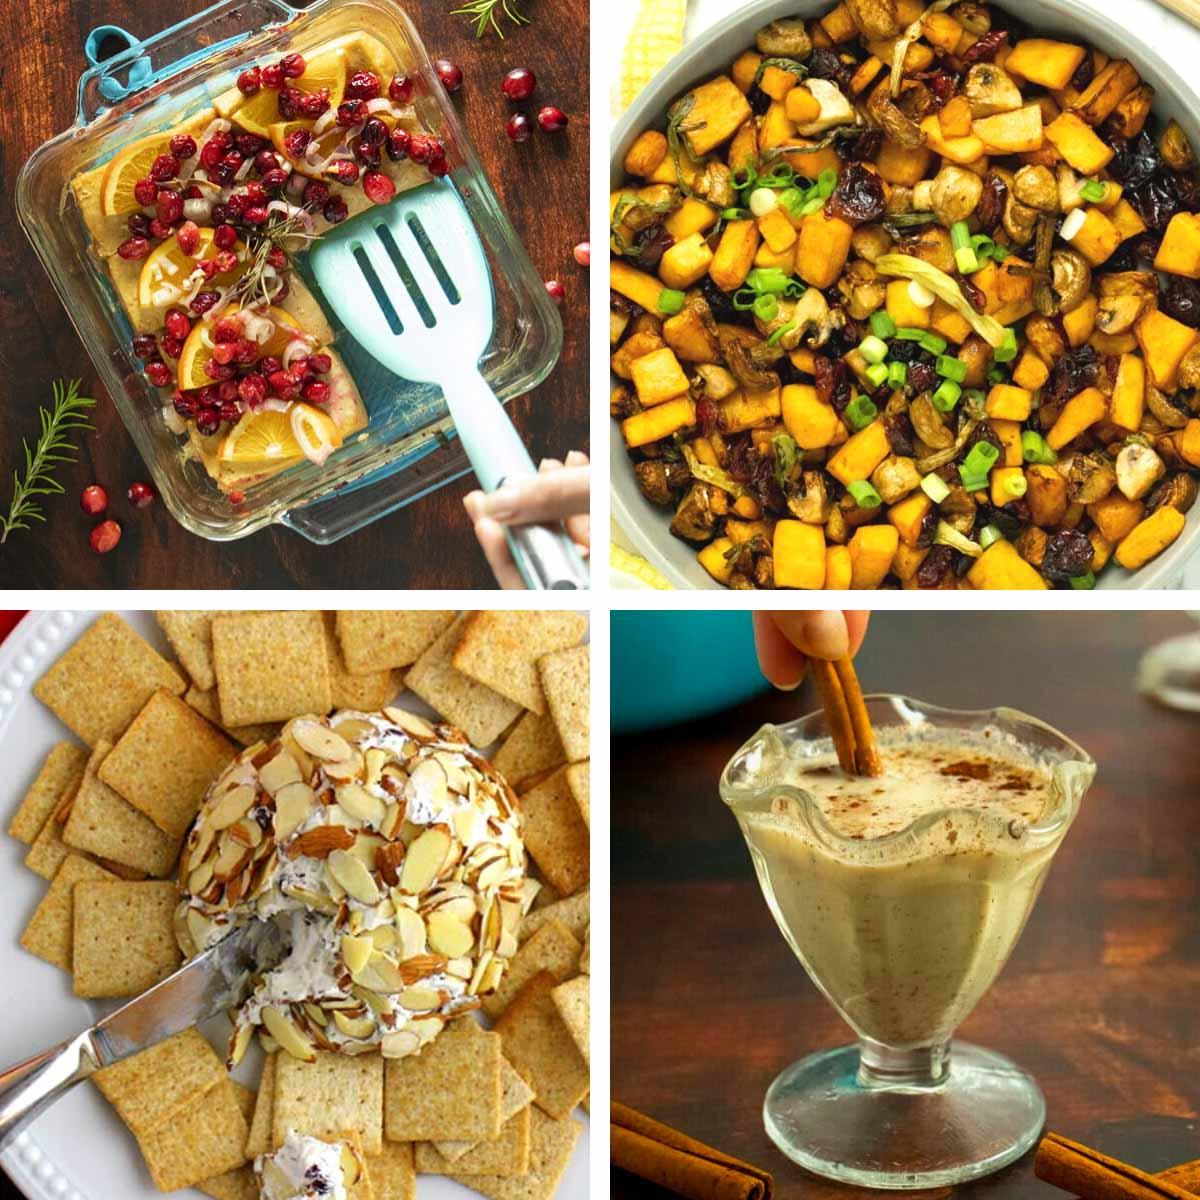 image collage of vegan holiday dishes: cranberry tofu, roasted squash, vegan cheese ball, and vegan eggnog